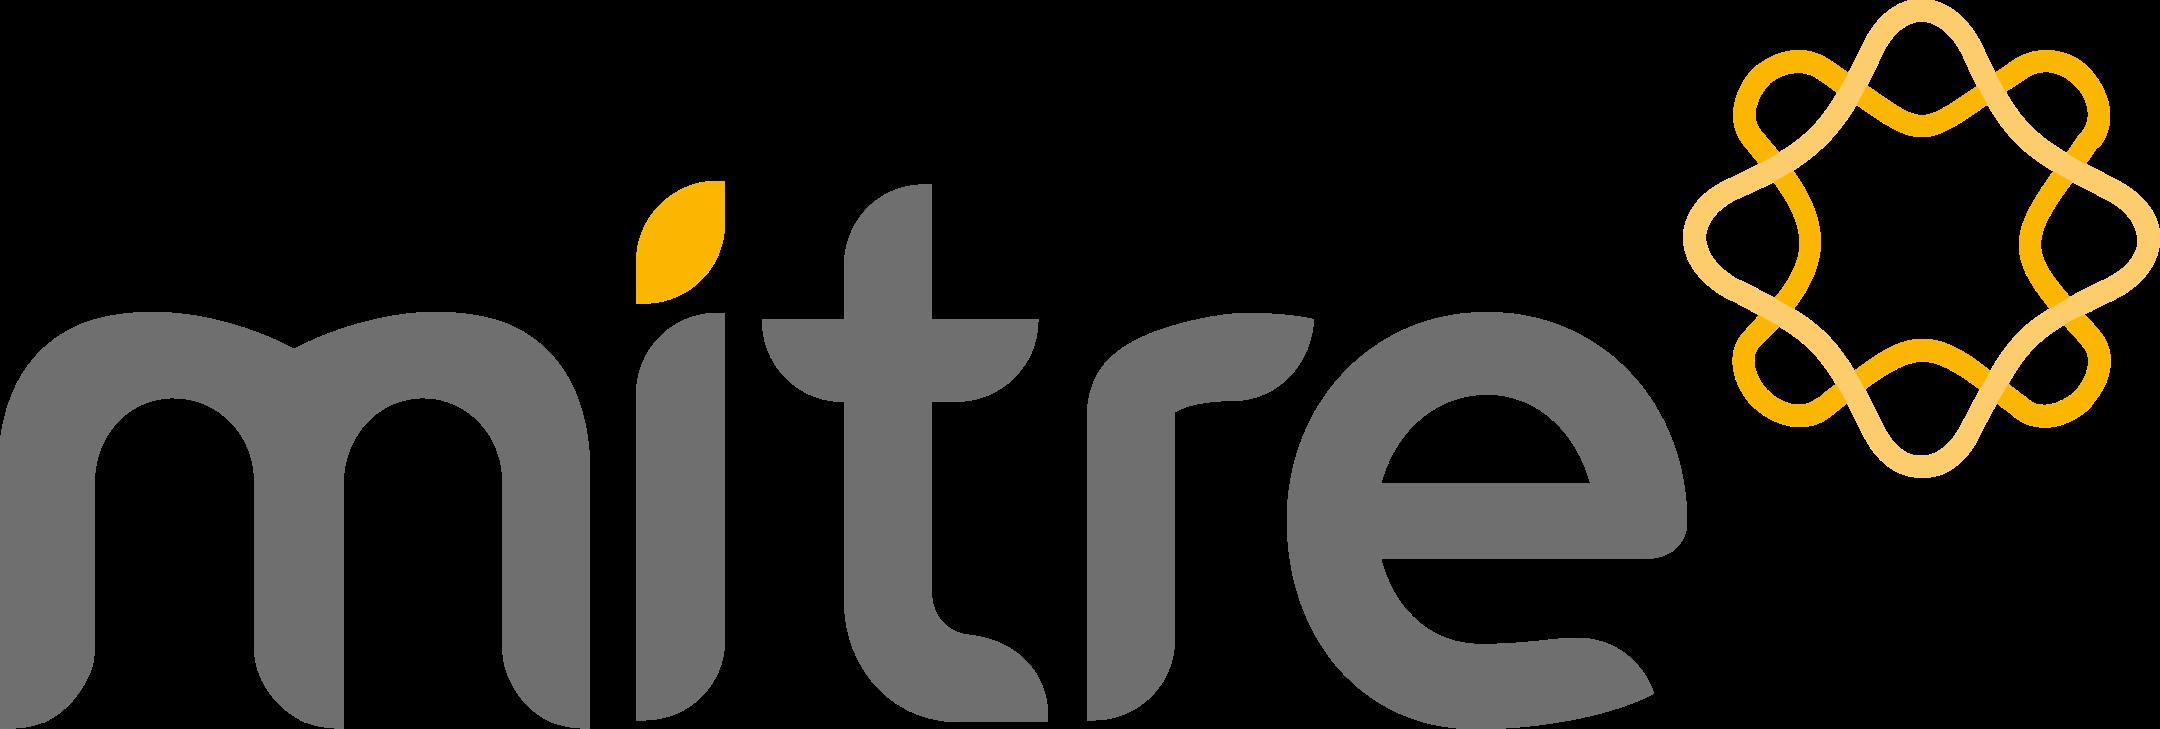 mitre logo 1 - Mitre Realty Logo